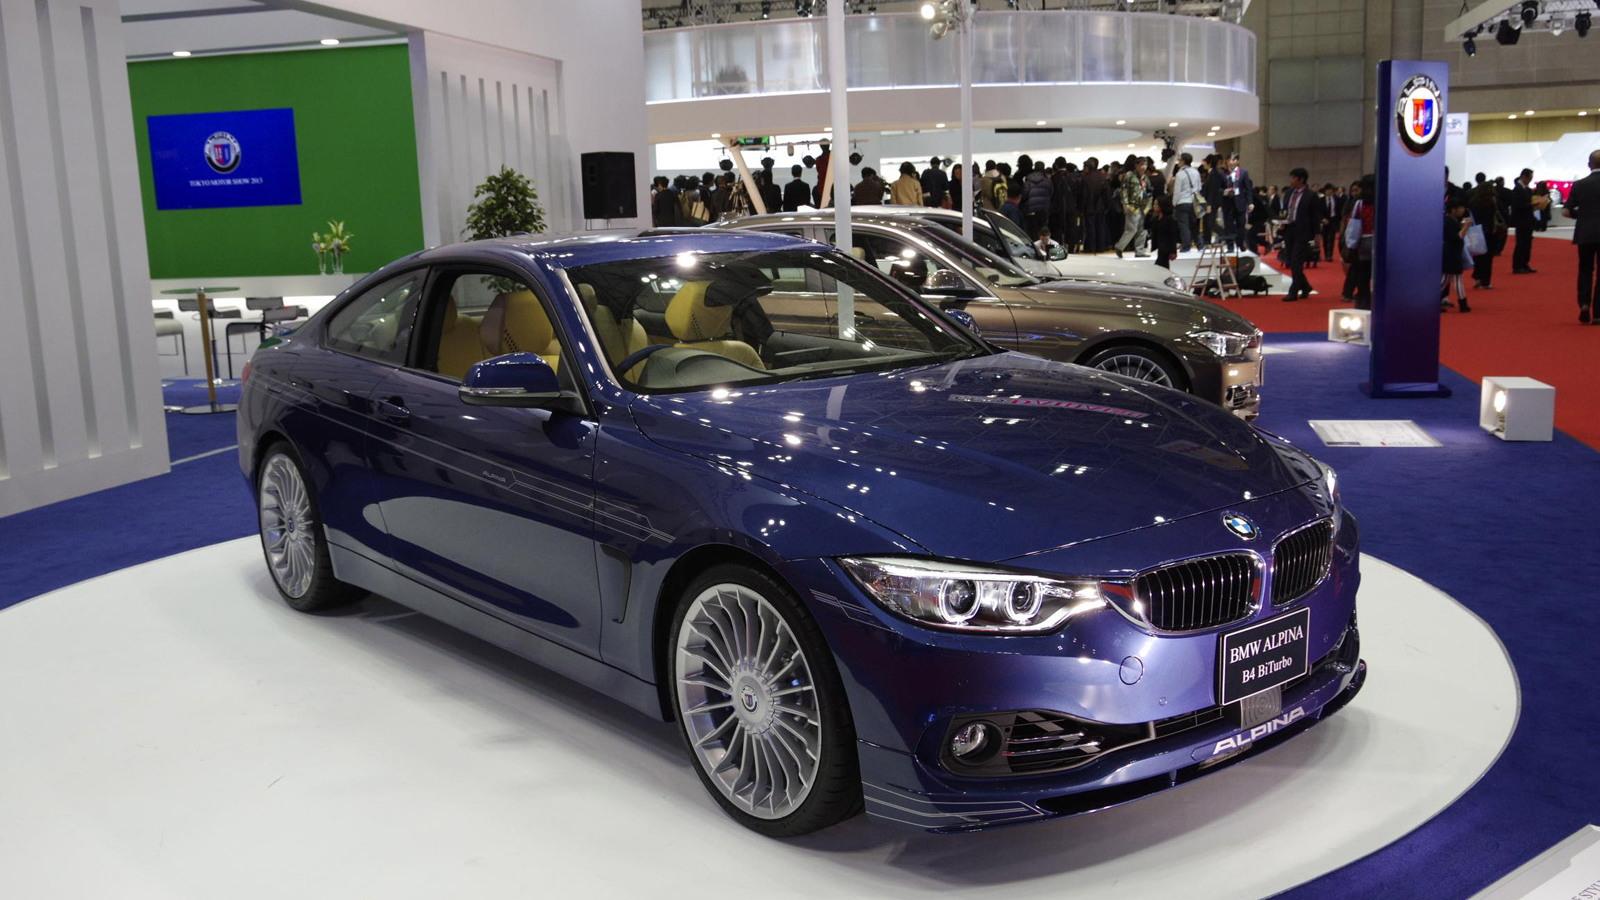 2014 BMW Alpina B4 Biturbo, 2013 Tokyo Motor Show